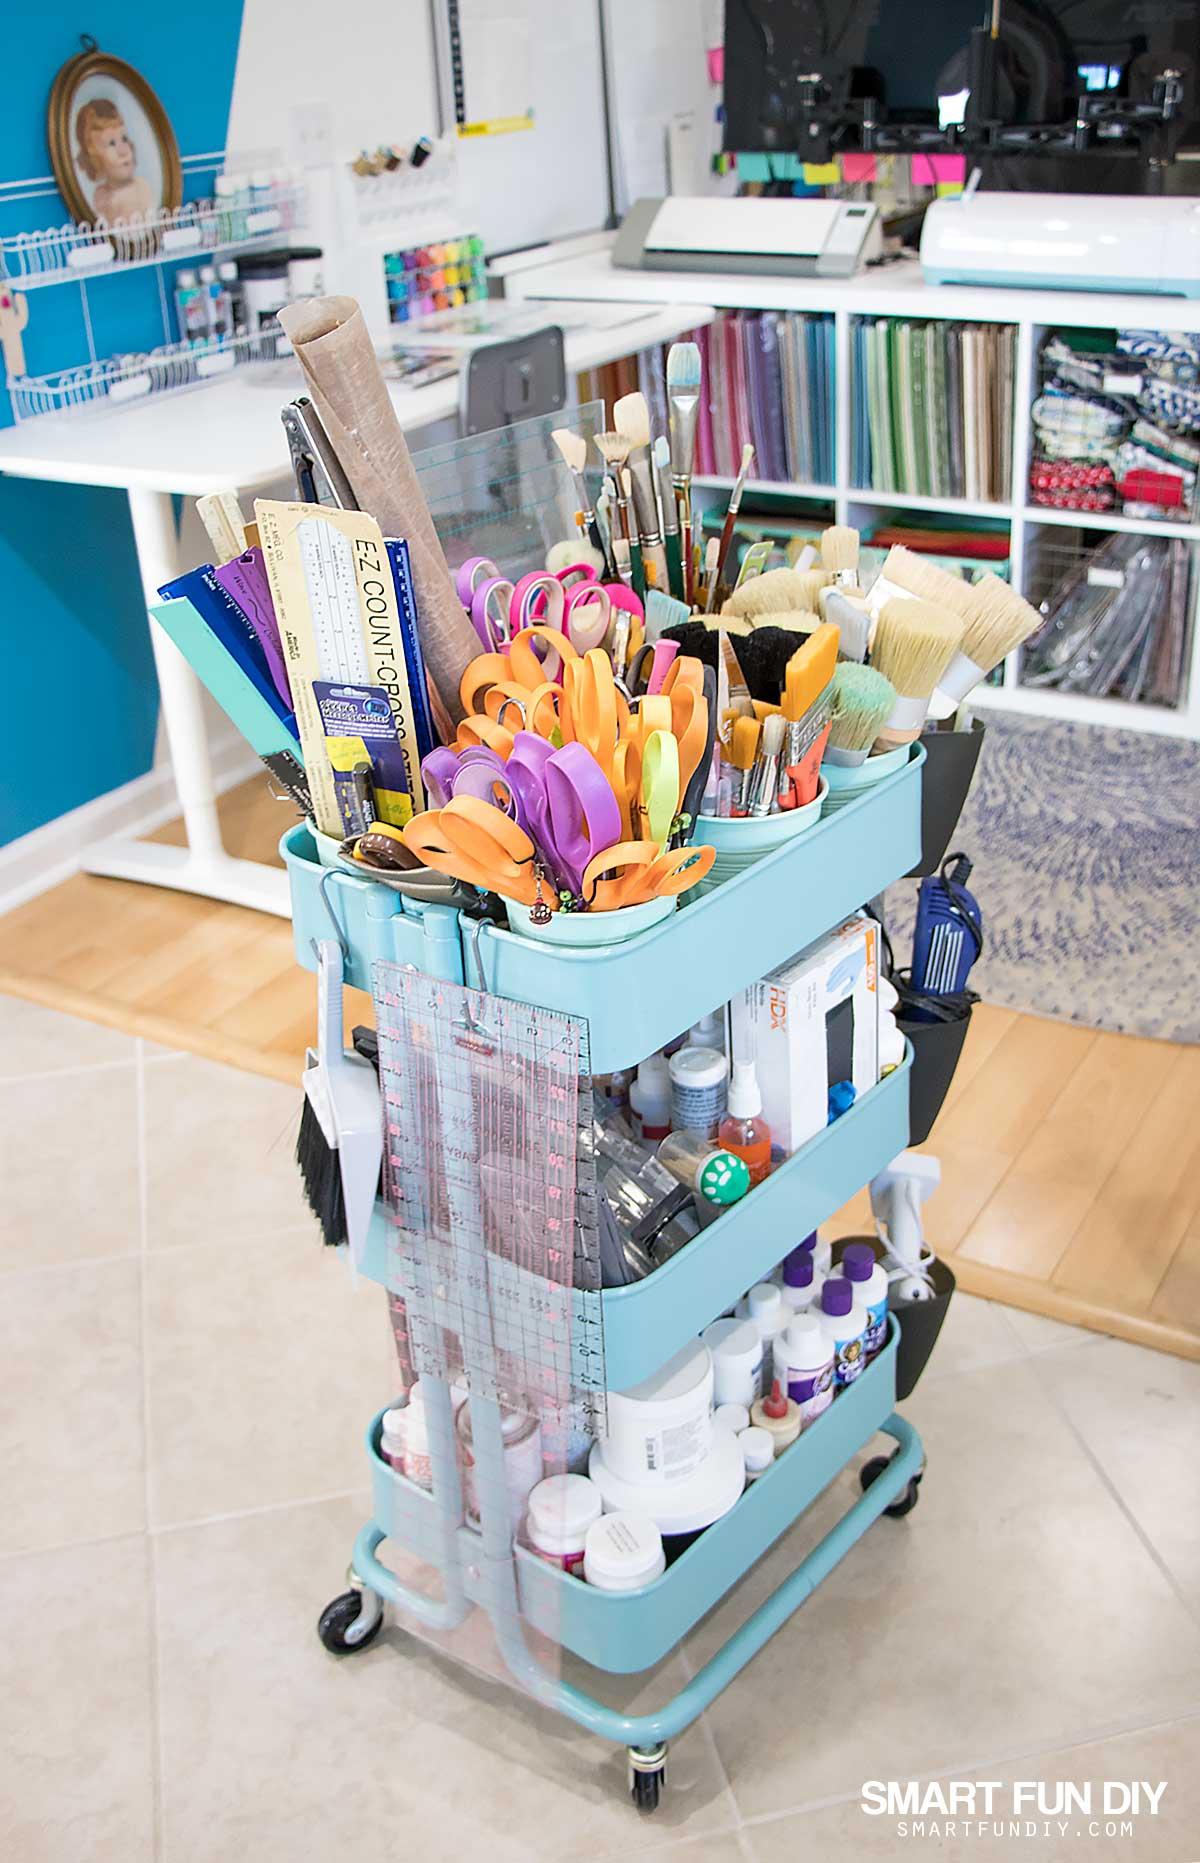 25 Raskog Ikea Cart Hacks For Crafts Smart Fun Diy